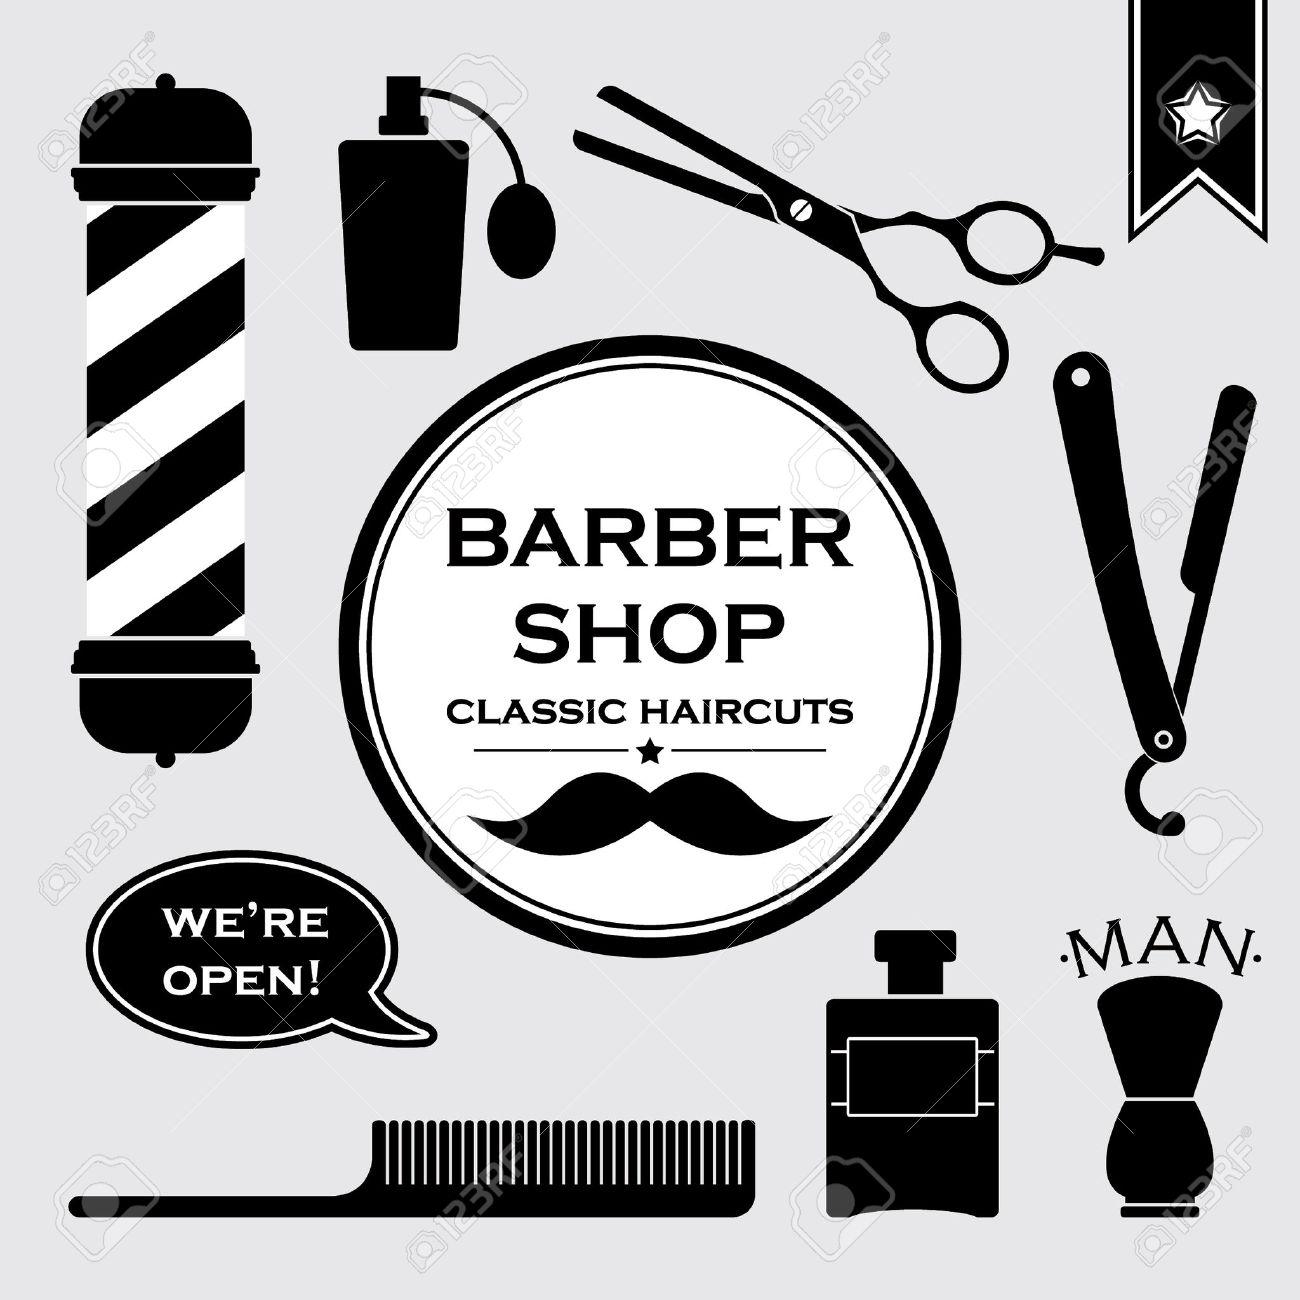 Barber Clipart barber scissors  Barbershop